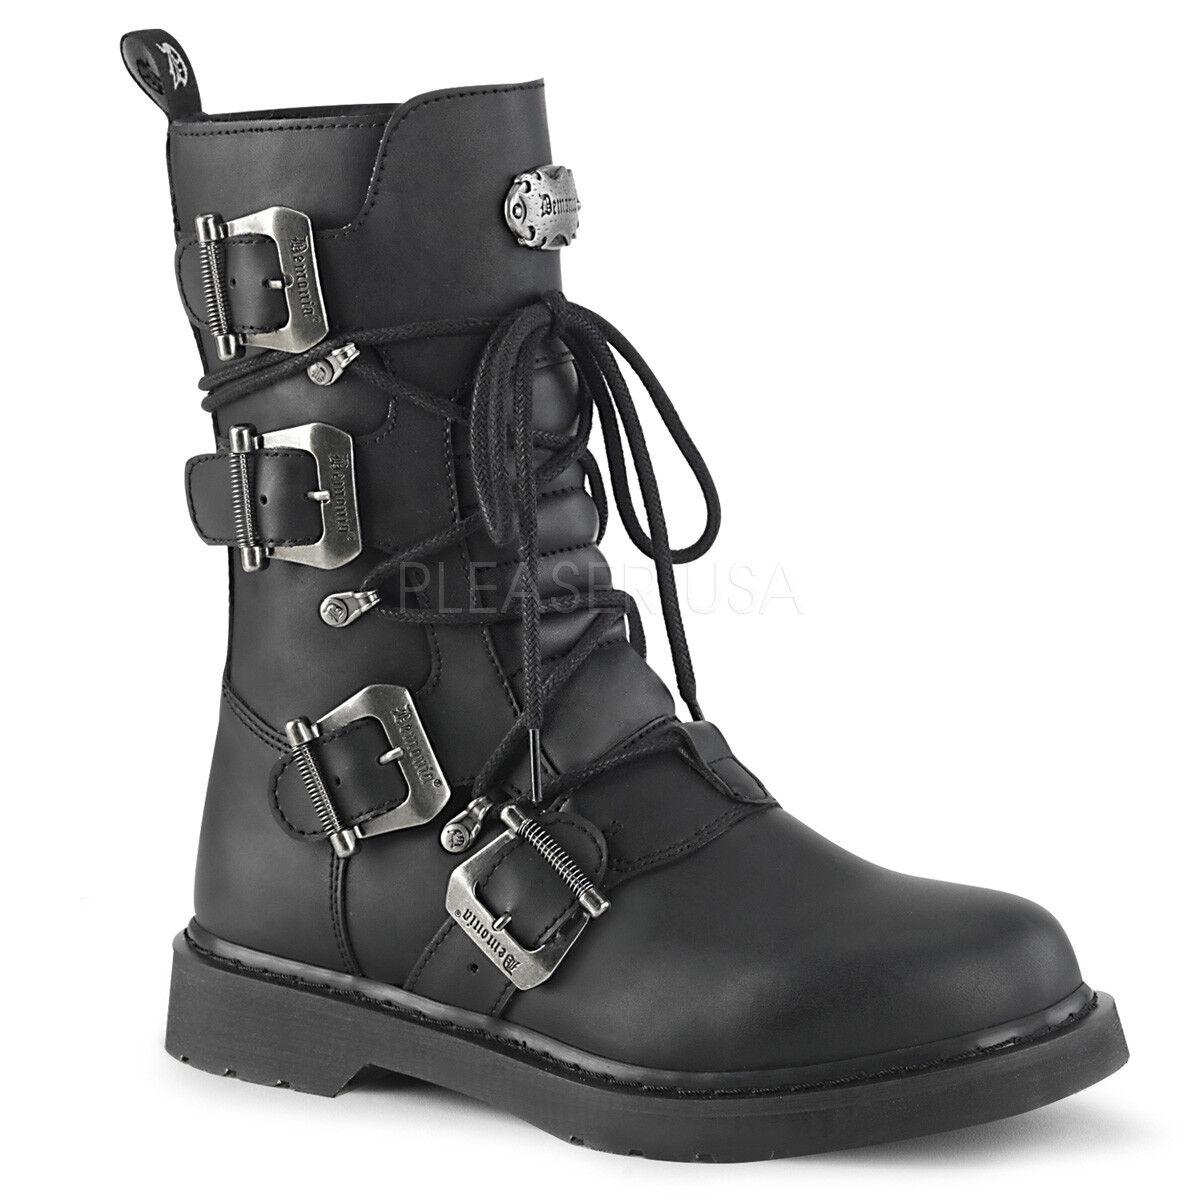 Demonia para Hombre Gotico Goth Punk Rock Biker Negro botas De Combate Perno - 265